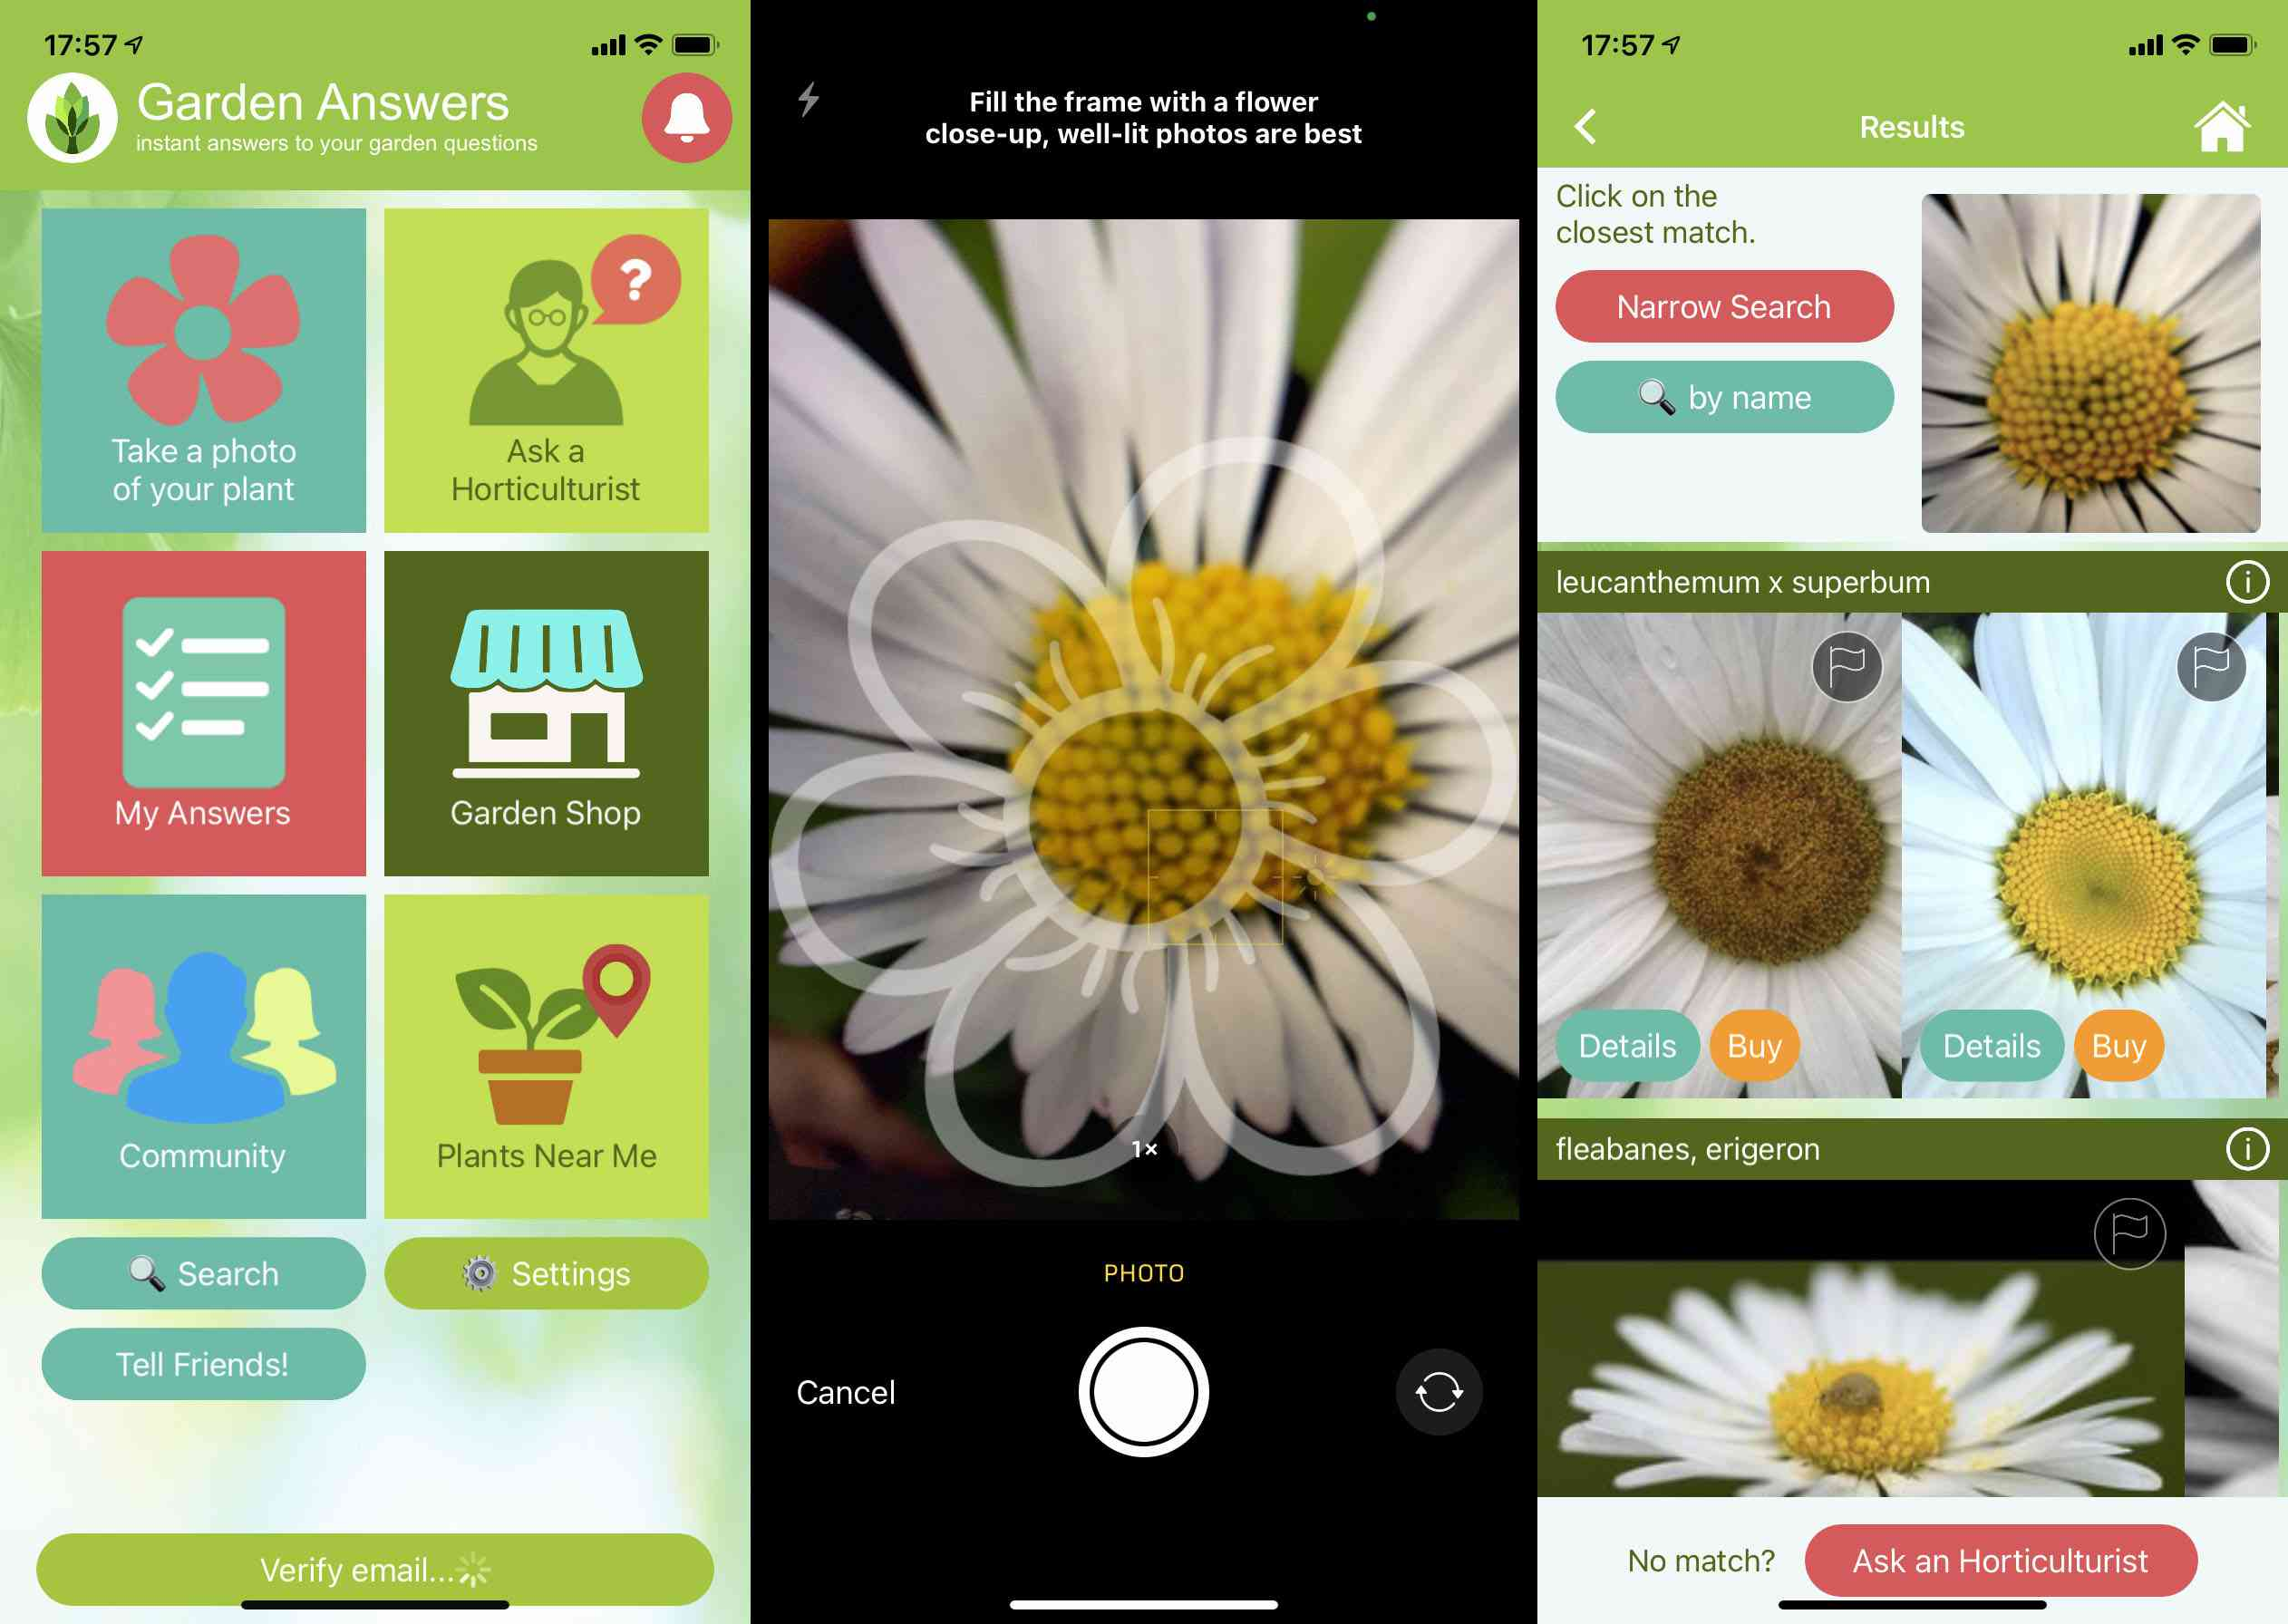 Garden Answers iOS app screenshots